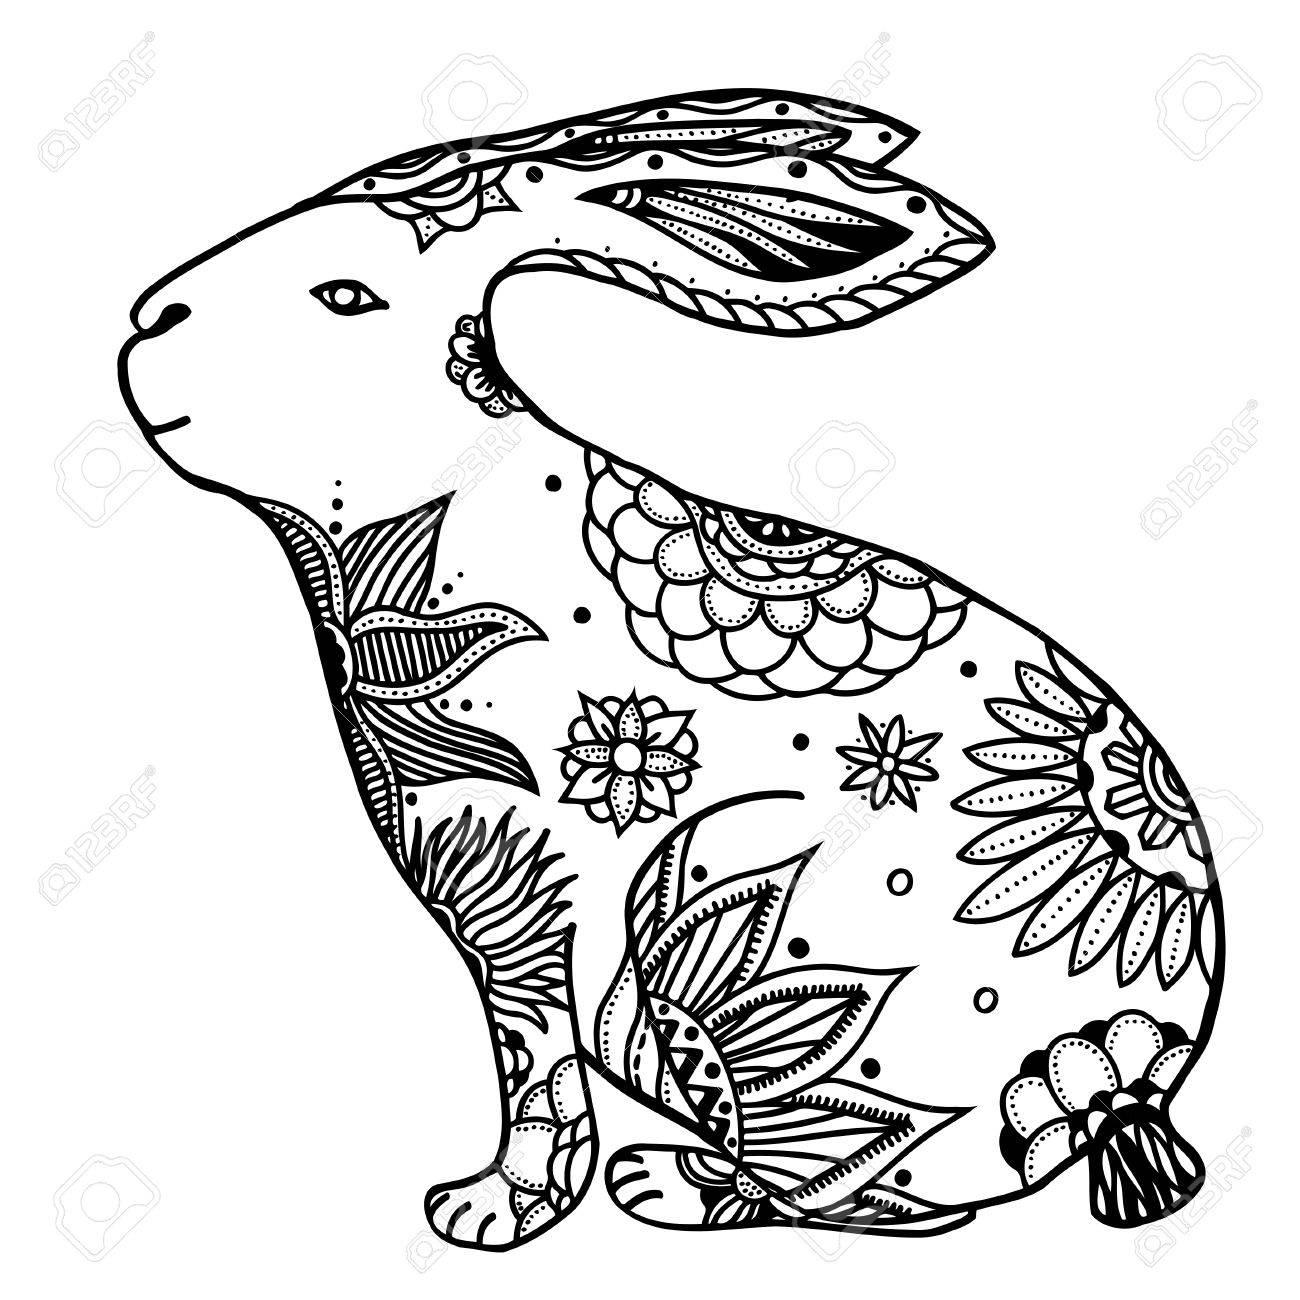 1300x1300 Decorative Hand Drawn Doodle Rabbit Illustration. Ornate White